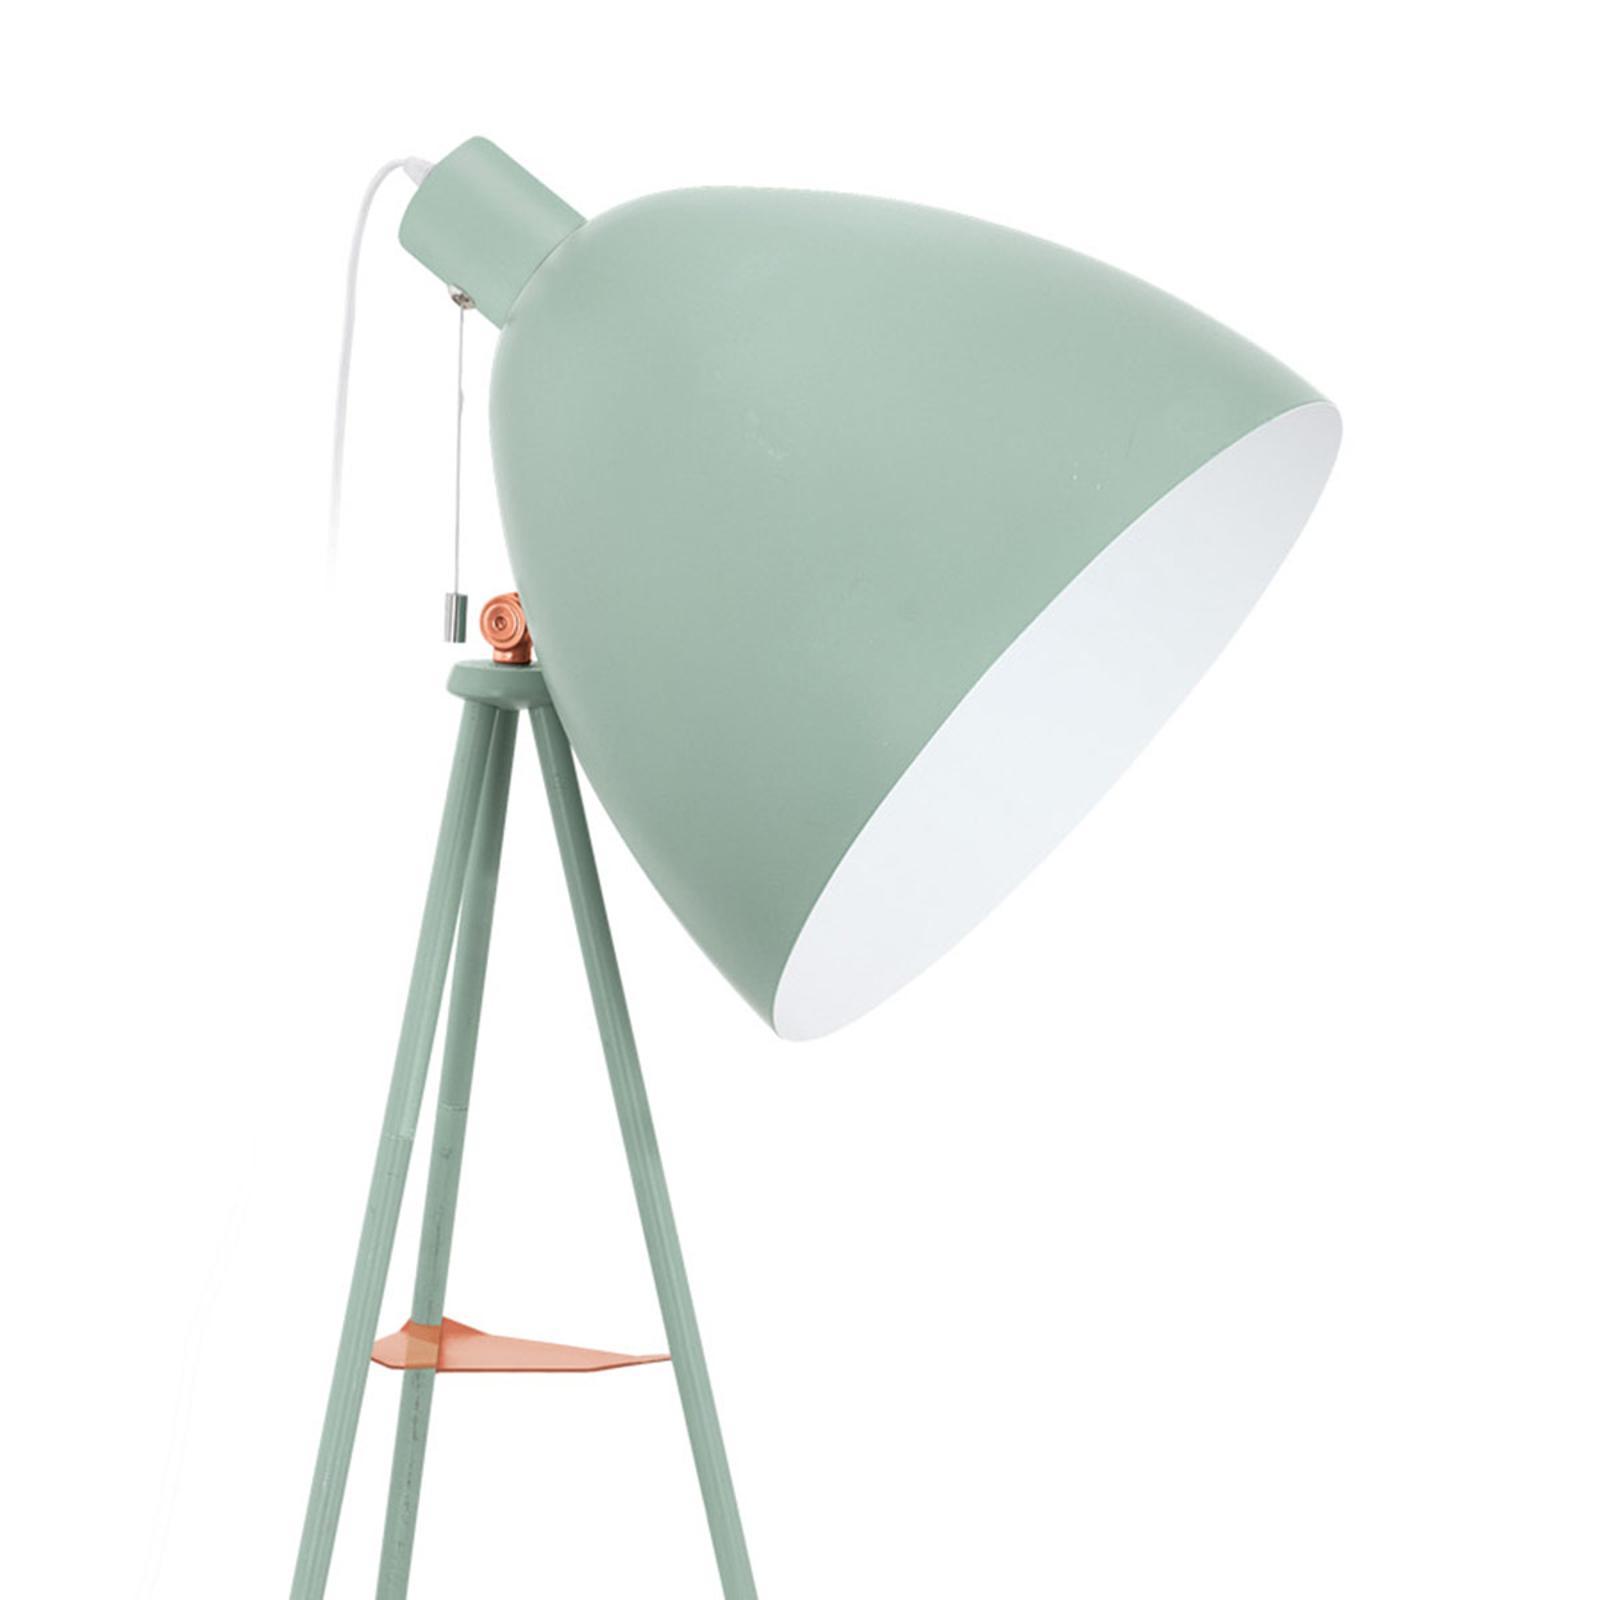 Stehlampe Dundee im Retrolook in Mintgrün